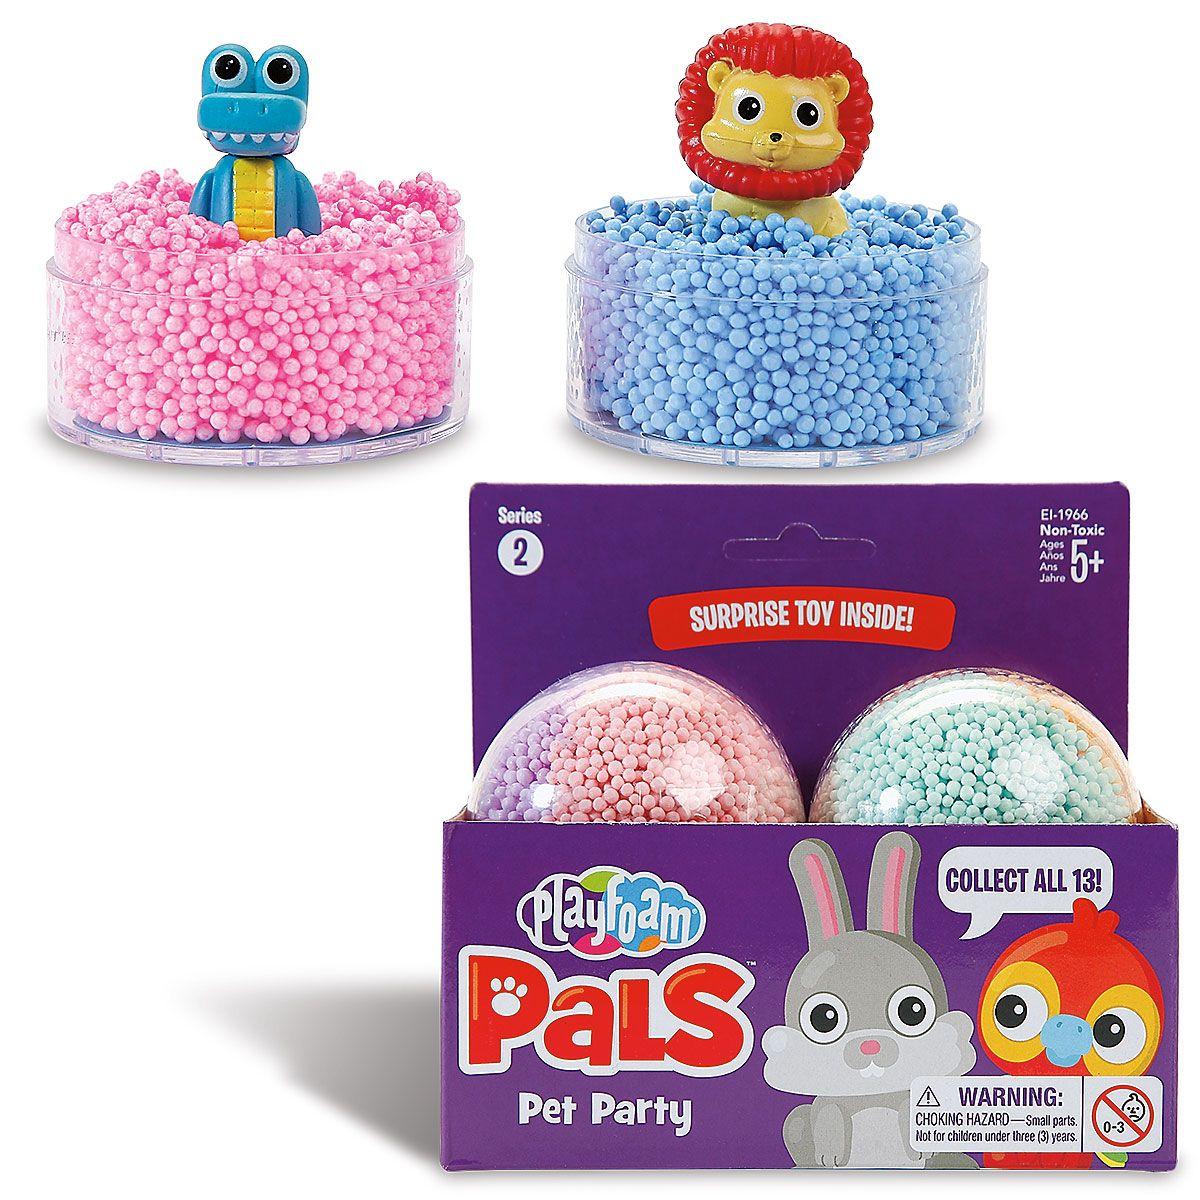 Playfoam Pet Party